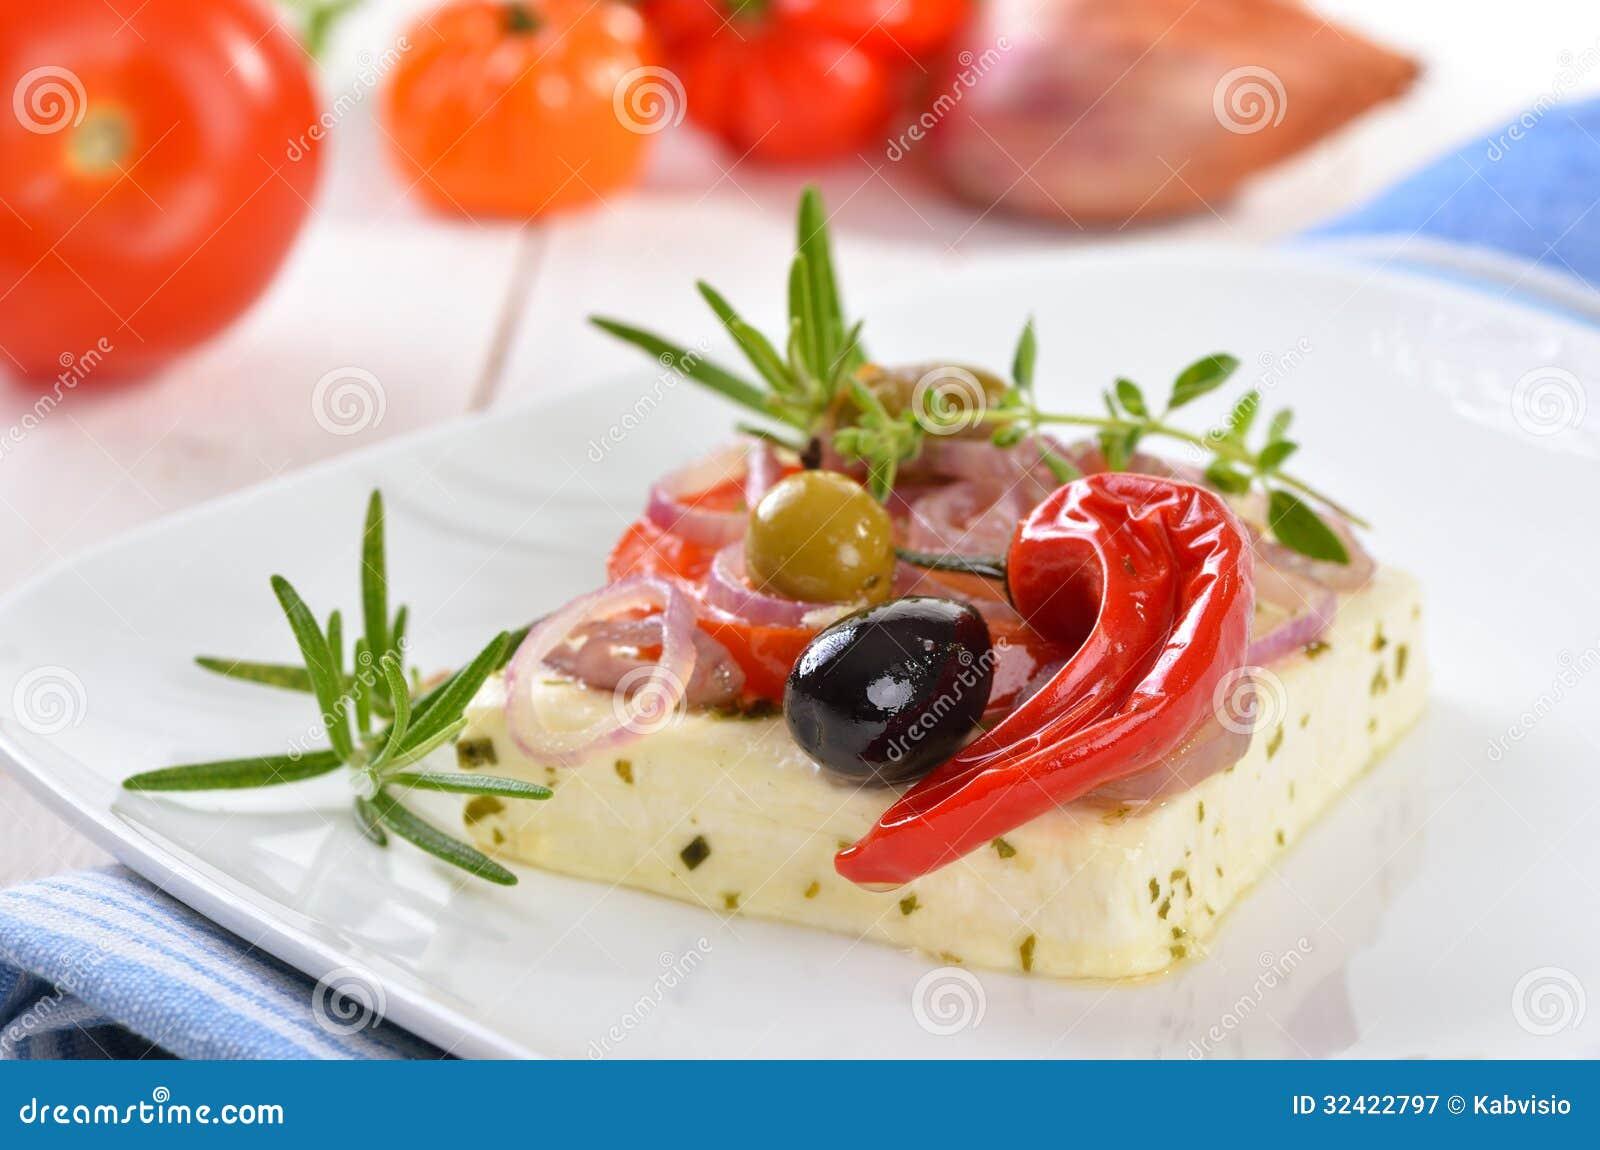 Baked Feta Cheese Royalty Free Stock Photography - Image ...